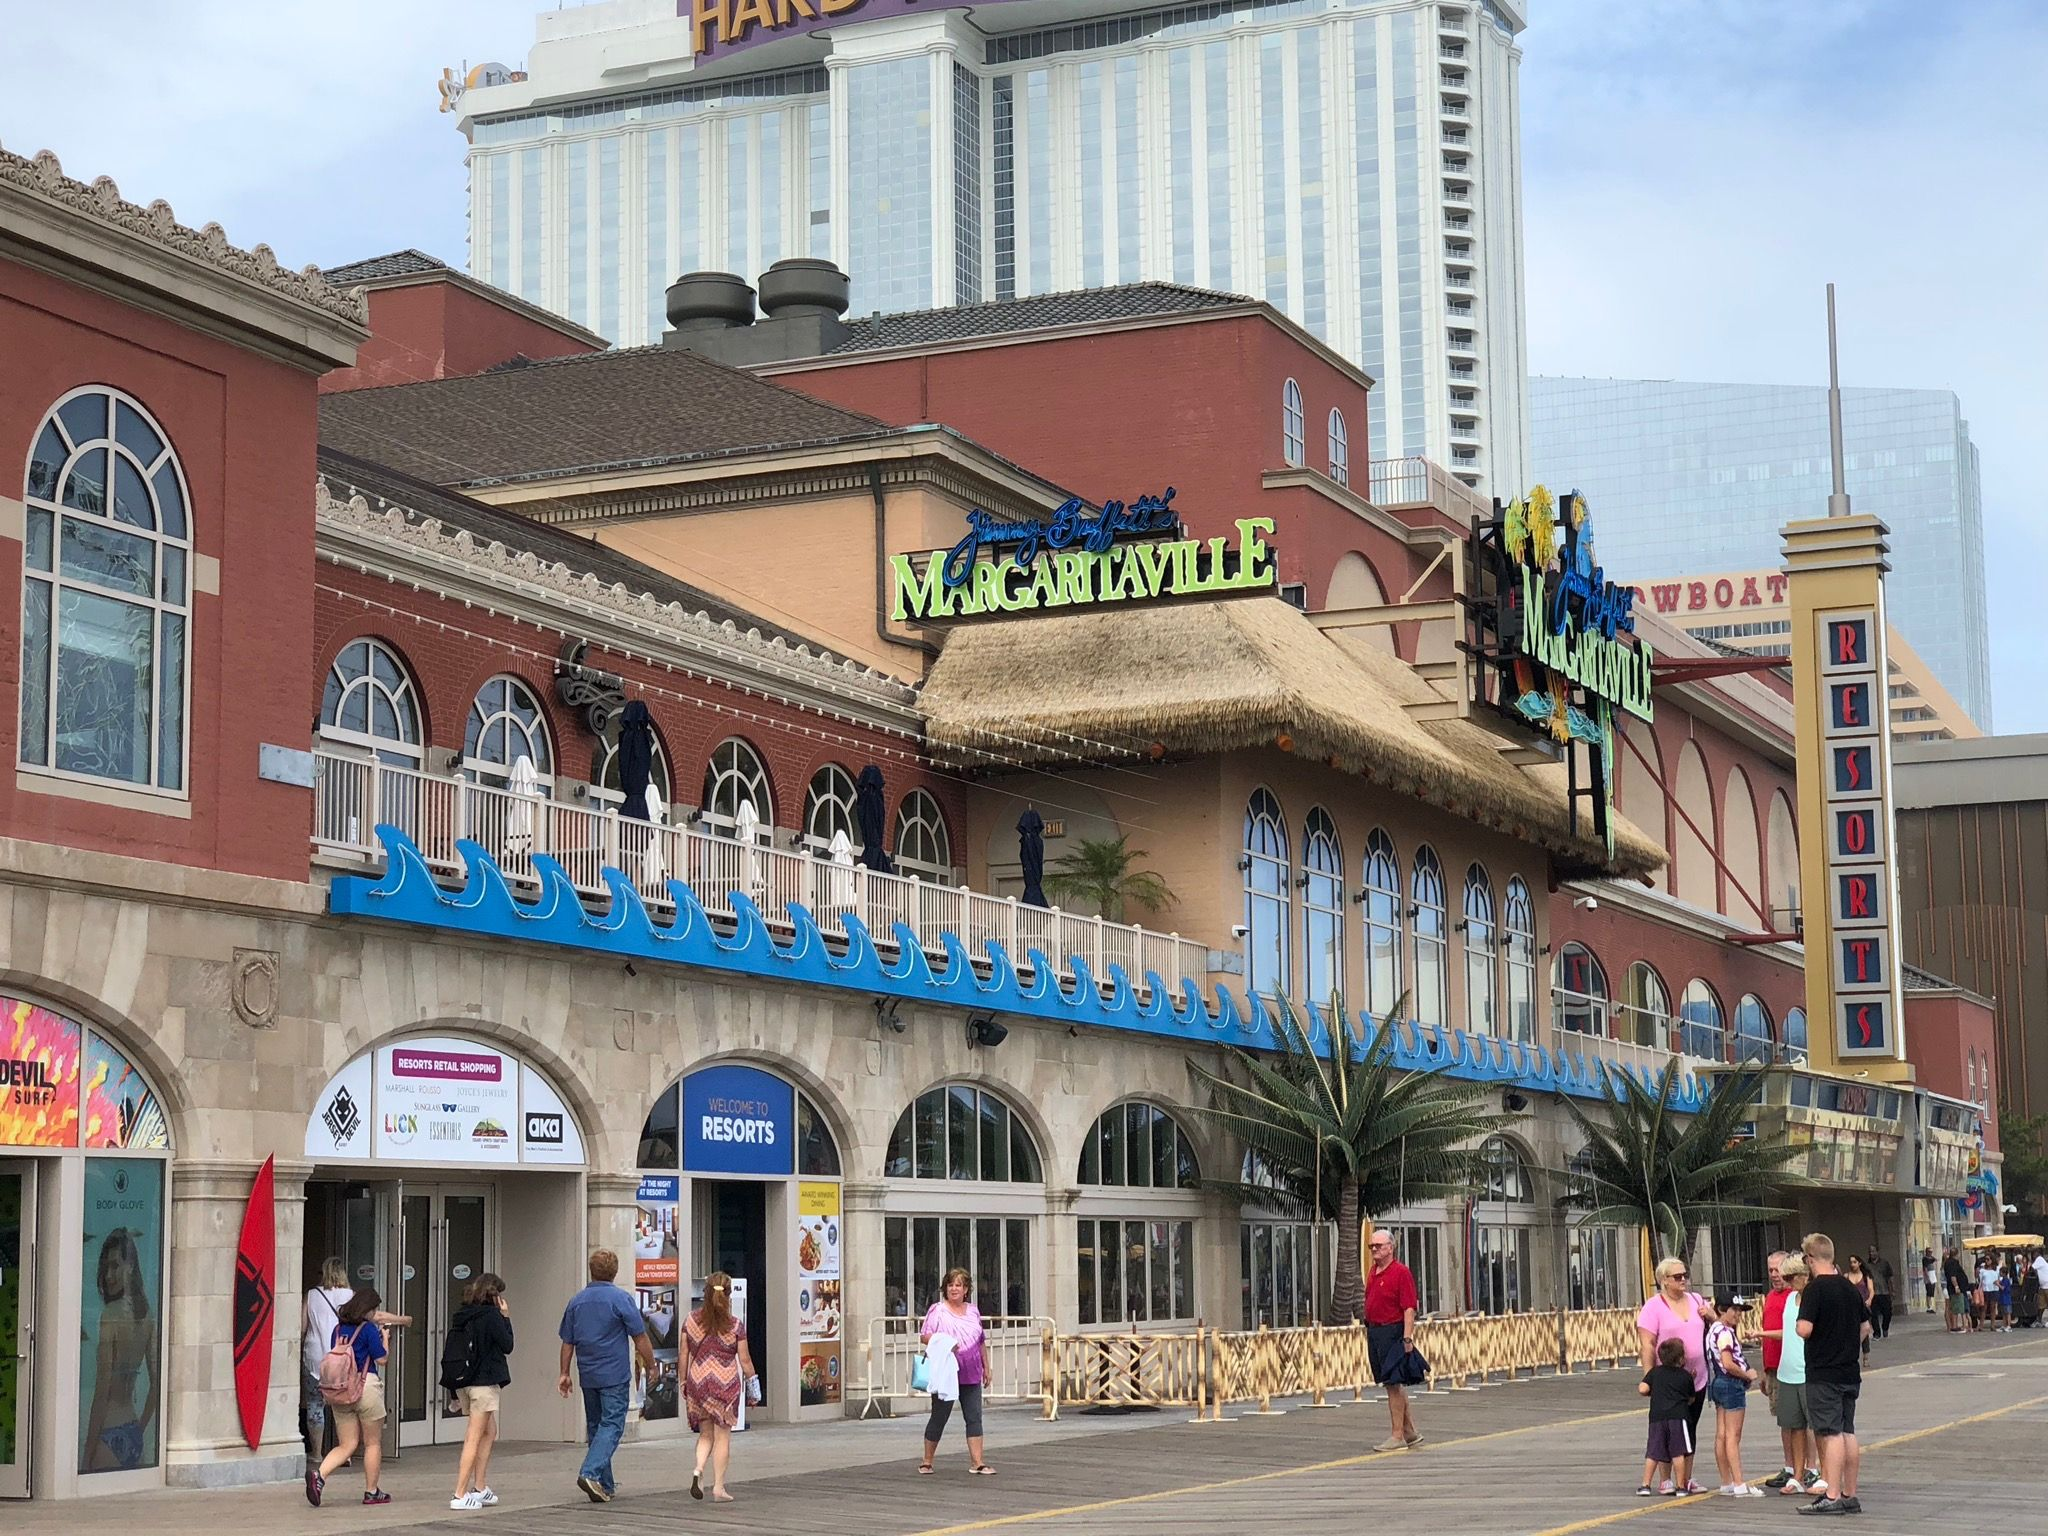 Margaritaville Restaurant Resorts Casino Hotel Atlantic